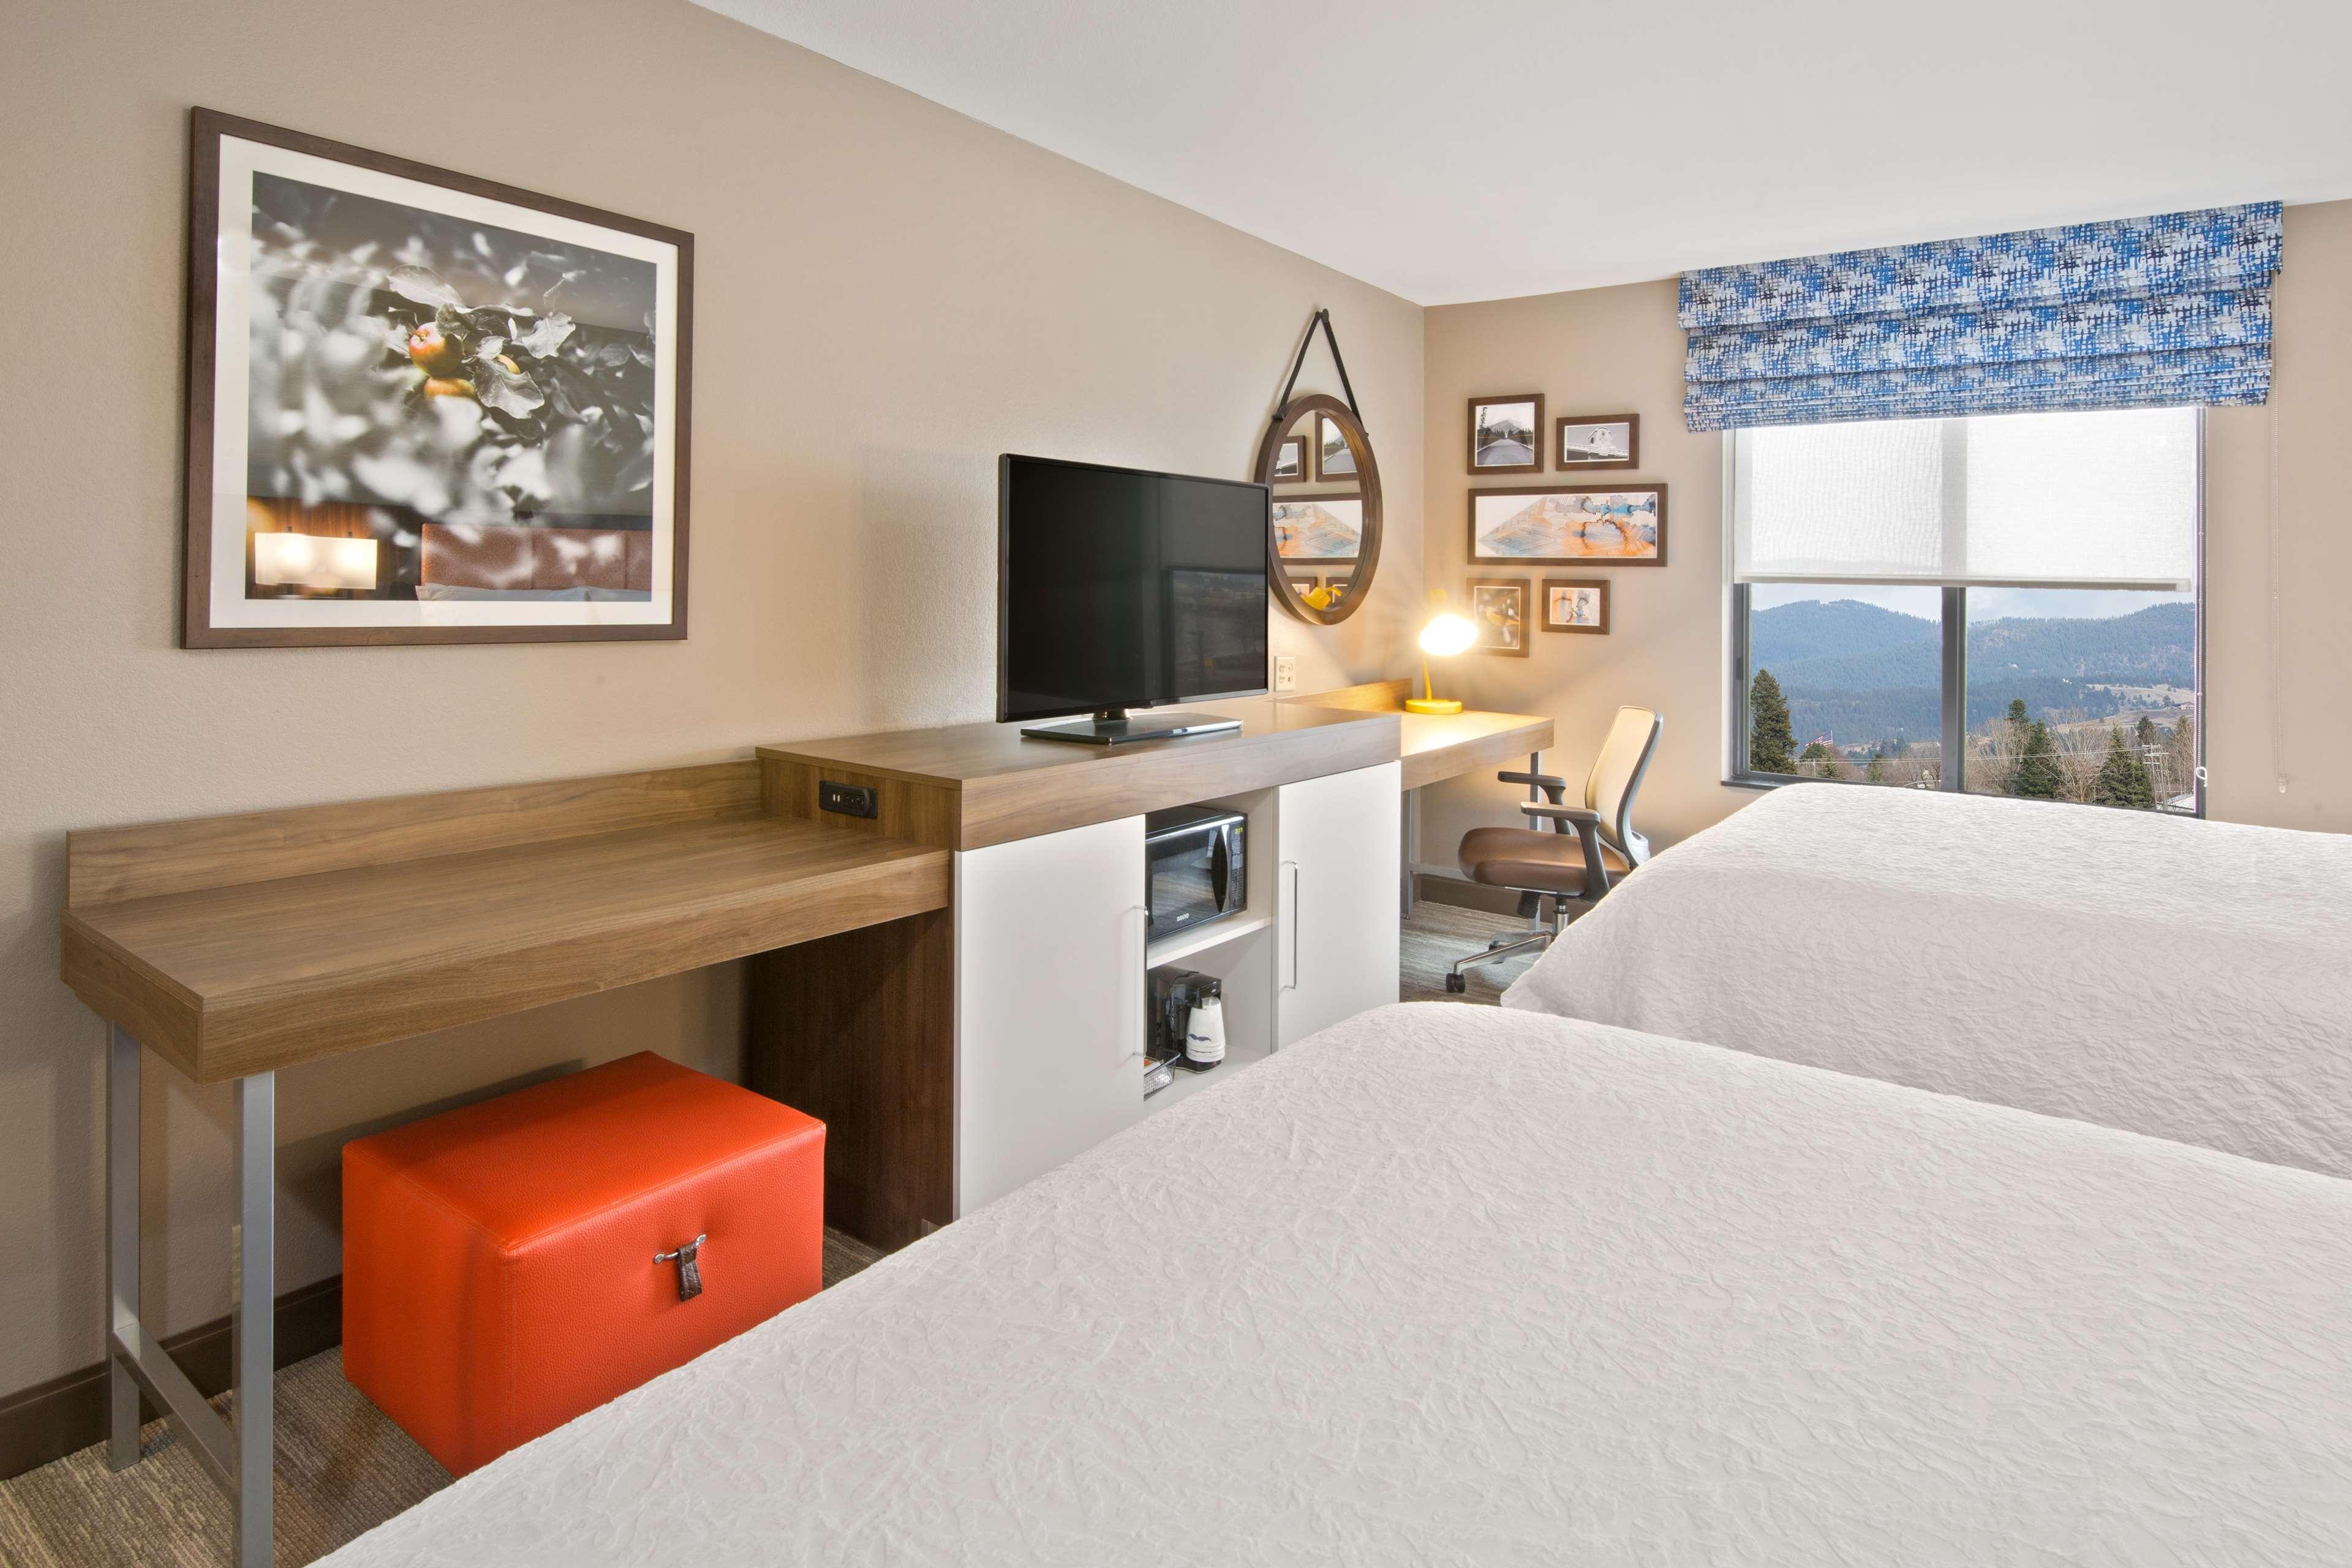 Hampton Inn & Suites Spokane Valley image 33